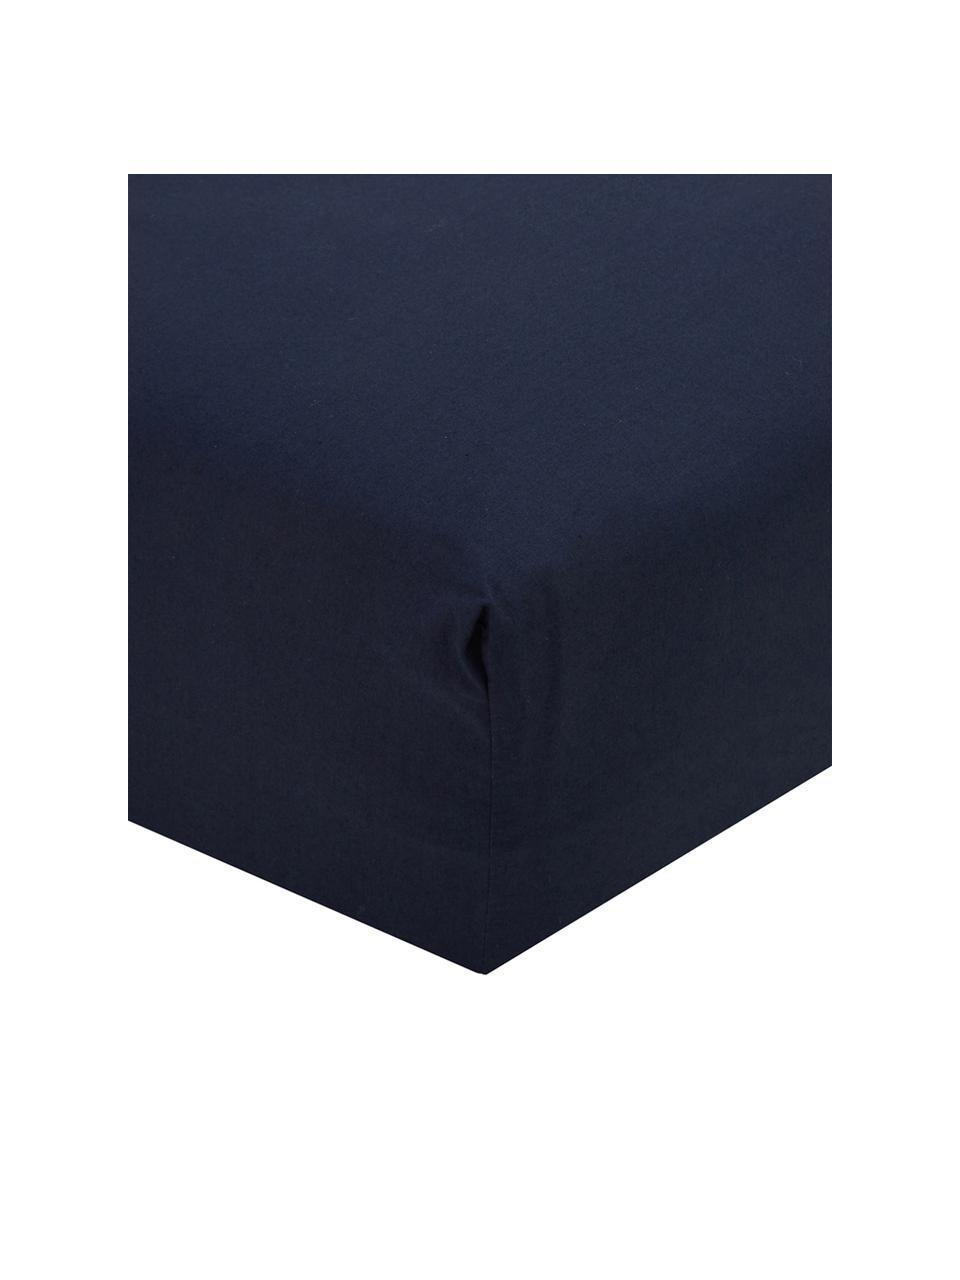 Drap-housse bleu foncé en percale Elsie, Bleu foncé